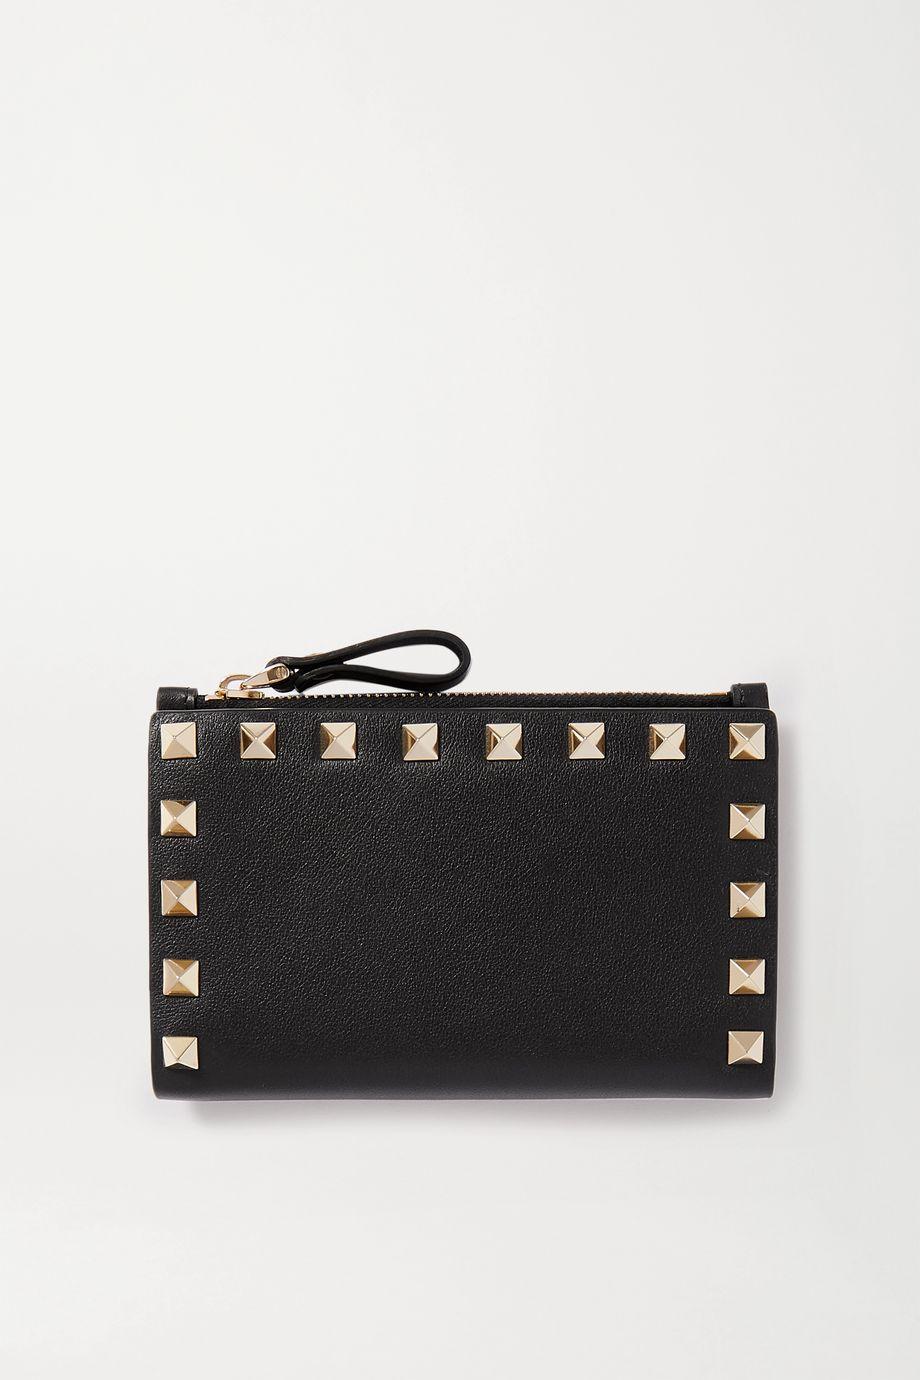 Valentino Valentino Garavani Rockstud medium leather wallet